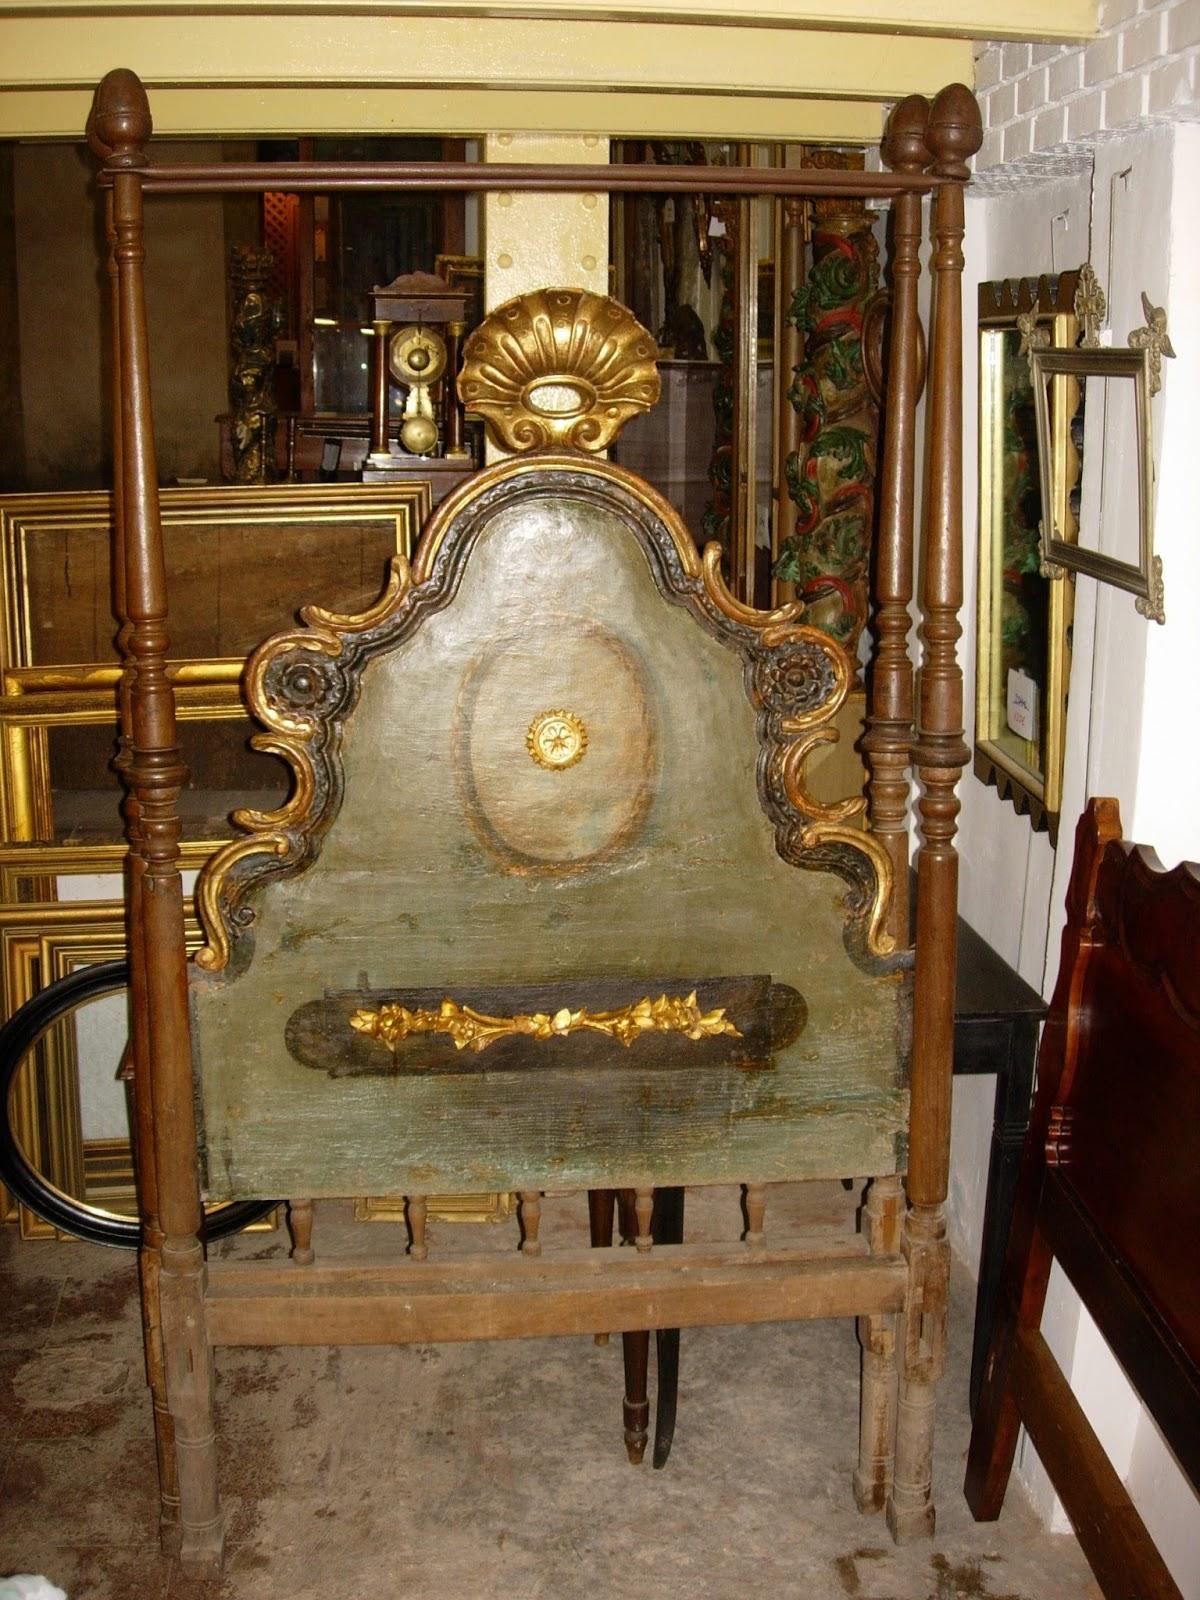 Antig edades fern ndez muebles armarios camas - Muebles siglo xviii ...